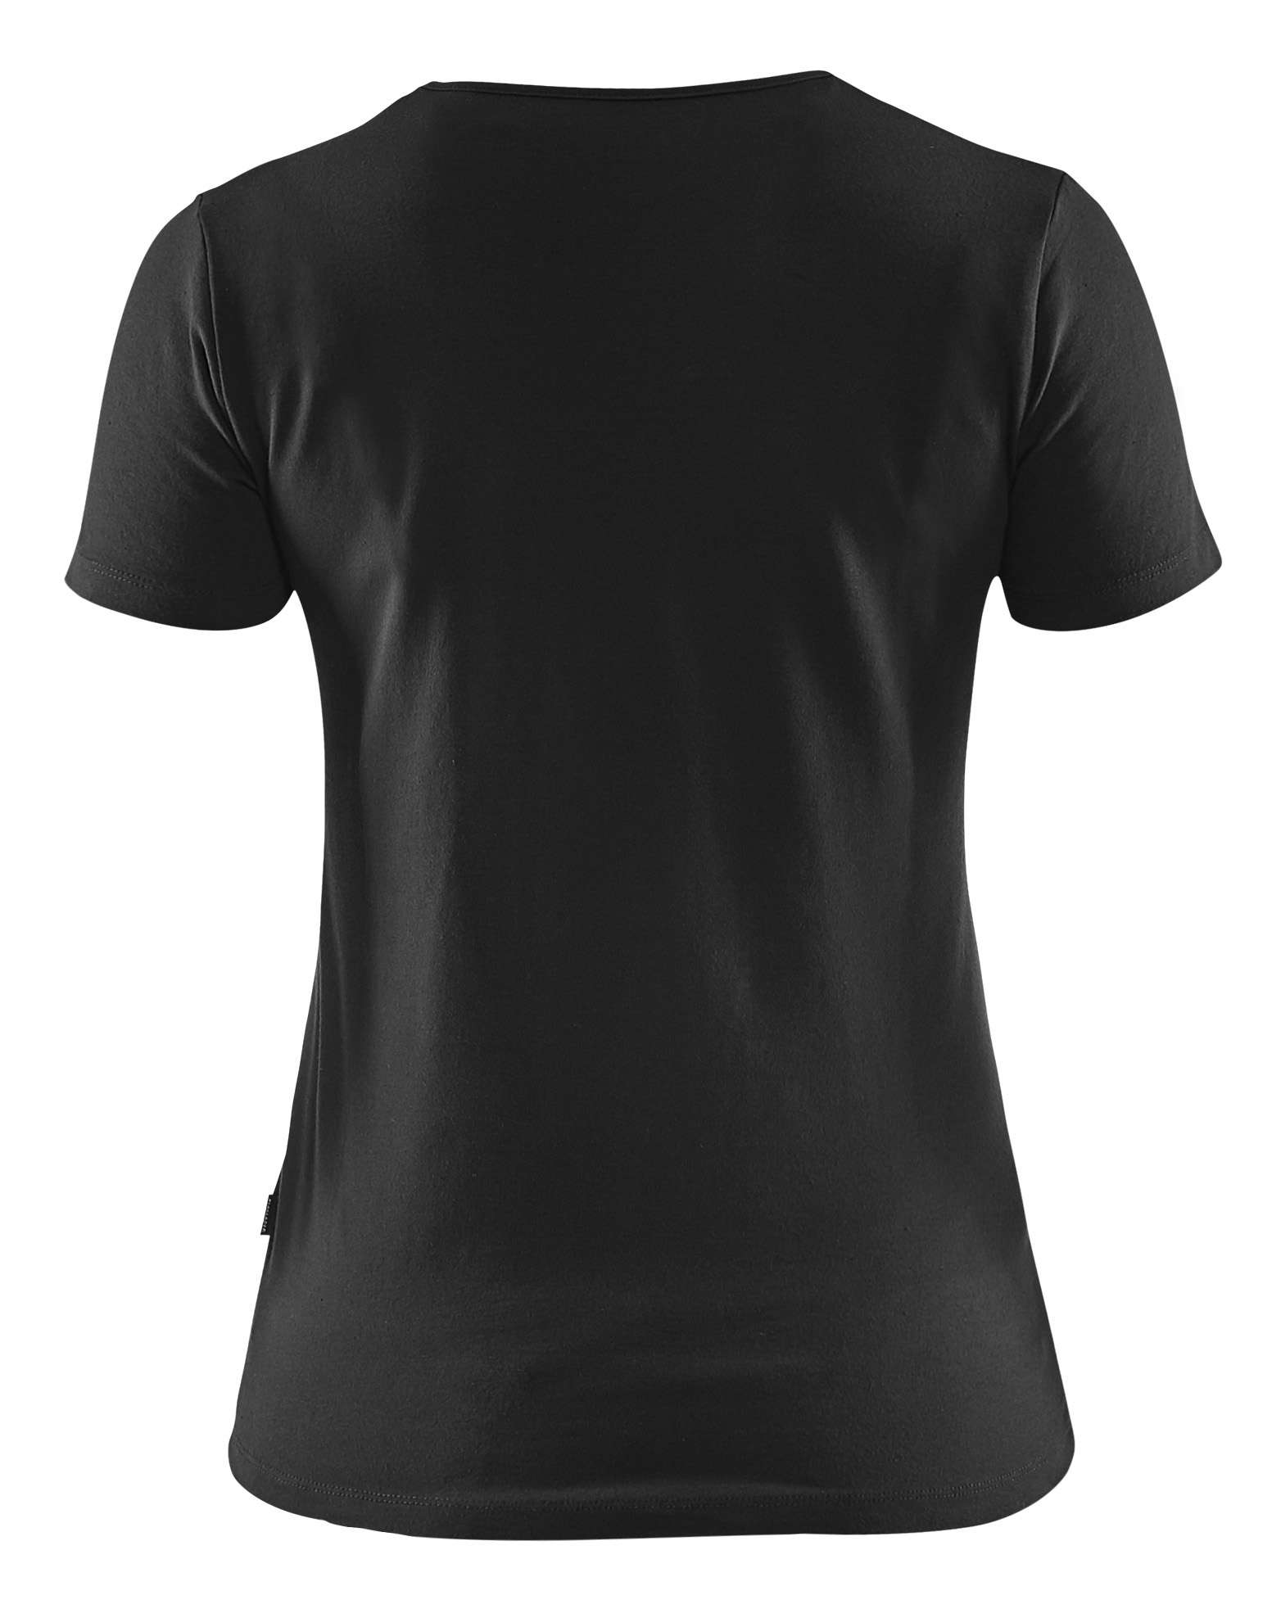 Blaklader Dames T-shirts 33041029 zwart(9900)